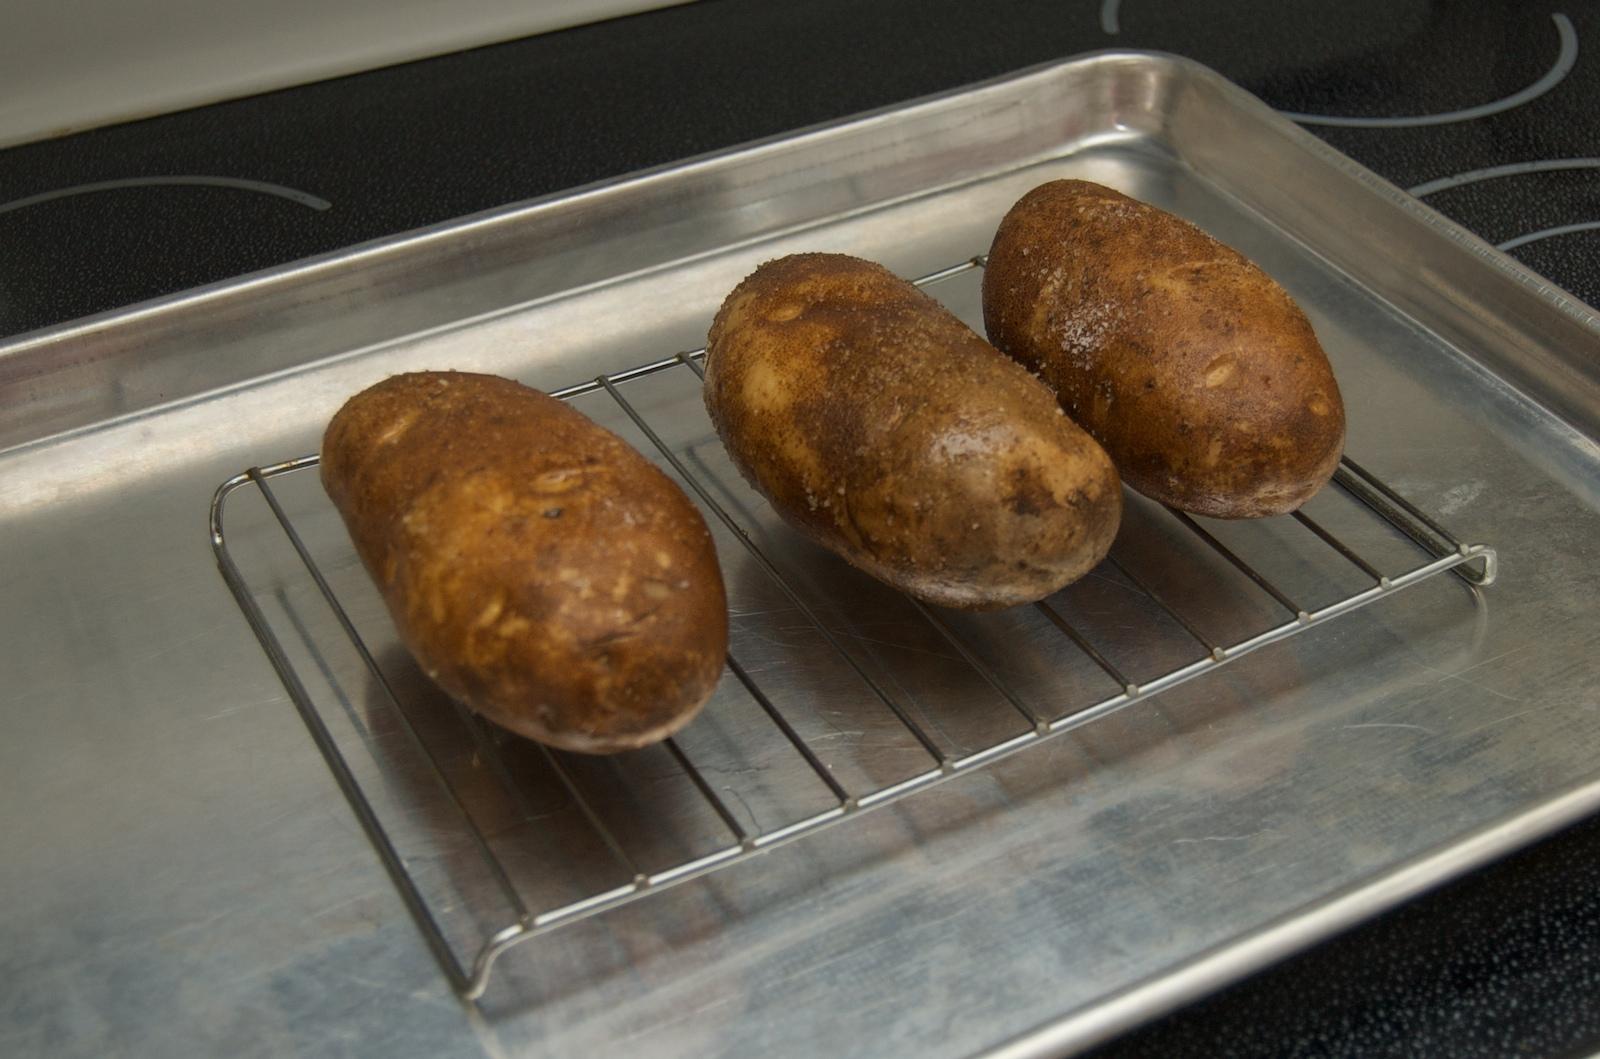 http://blog.rickk.com/food/2009/12/25/baked_potato.jpg